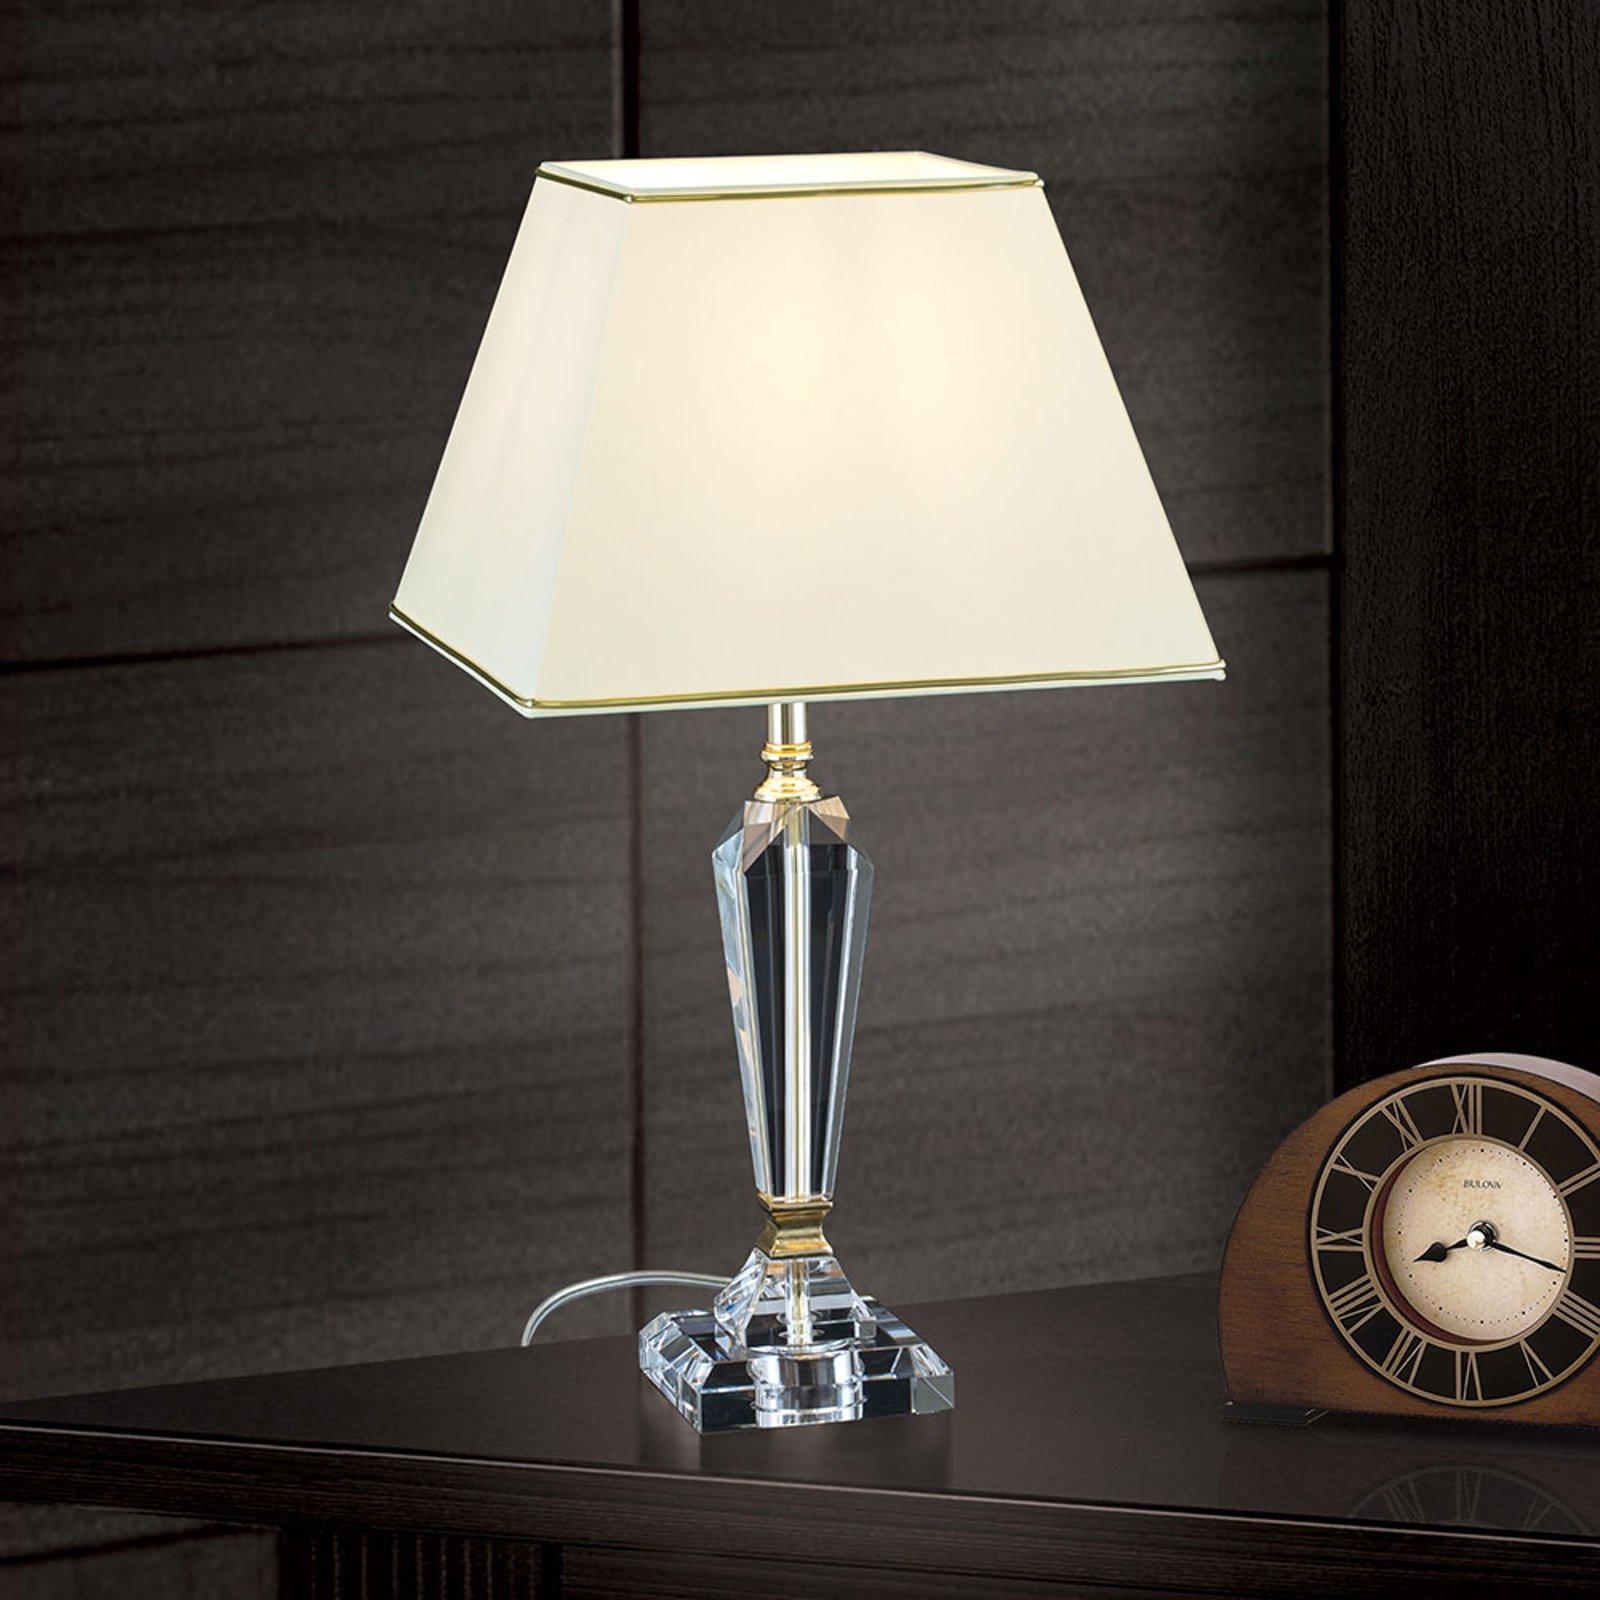 Bordlampe Veronique, fot smal, krem/gull